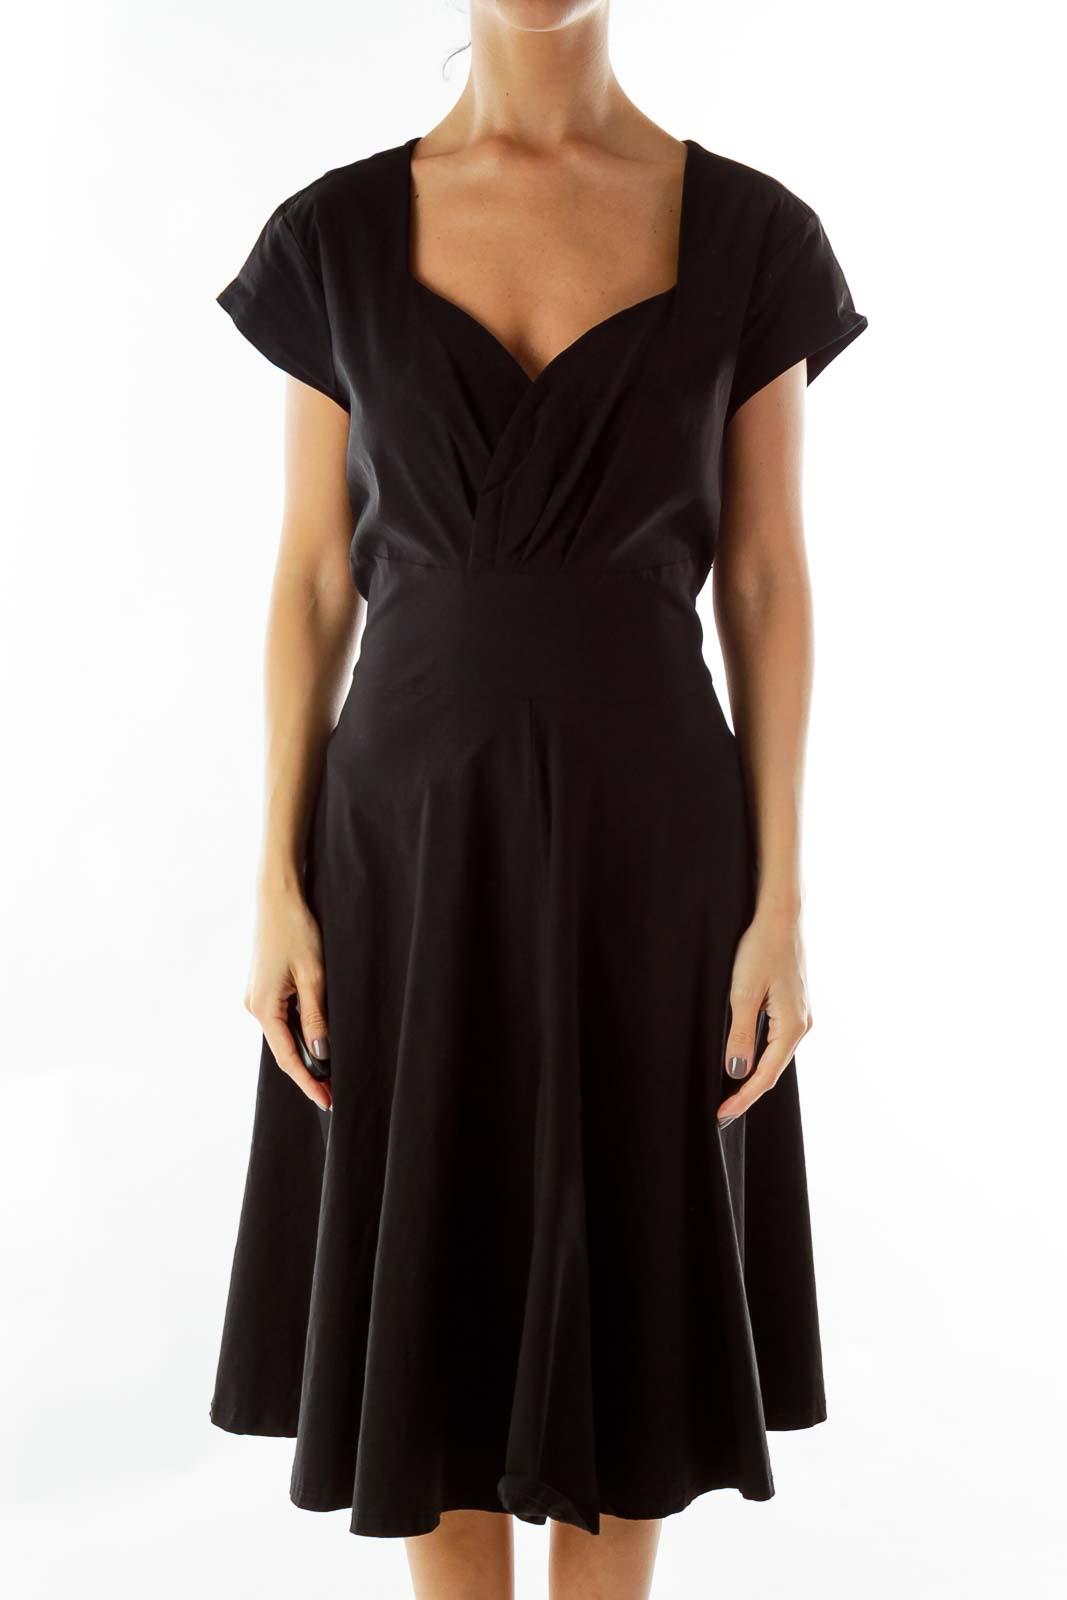 Black Sweetheart-Neckline A-Line Dress